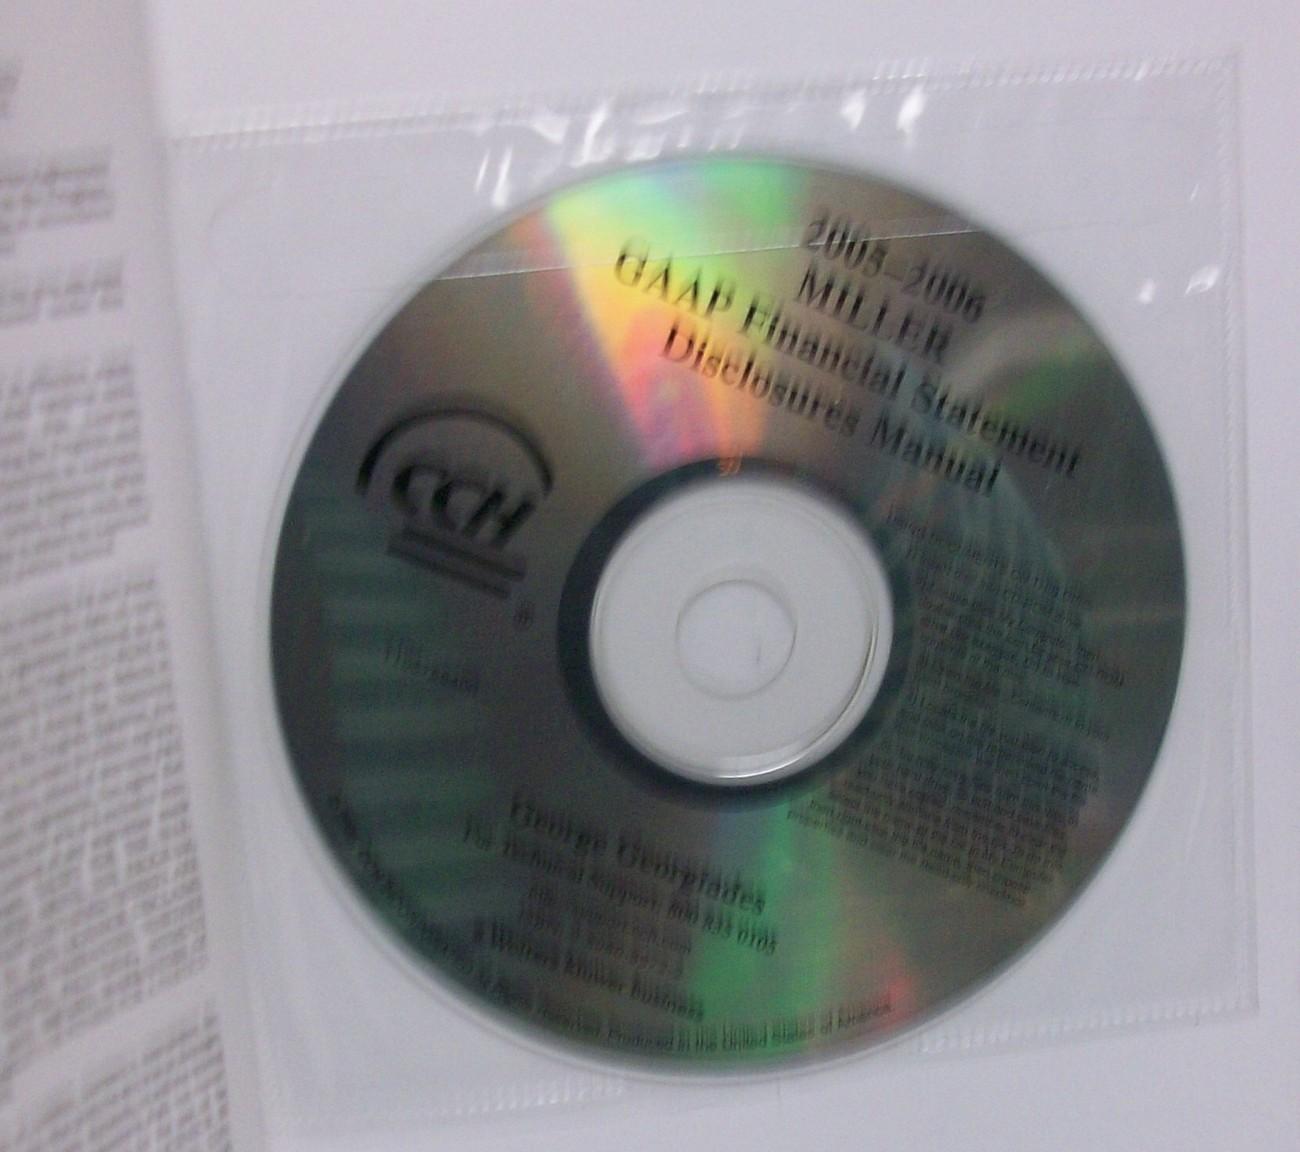 GAAP Financial Statement Disclosures Manual